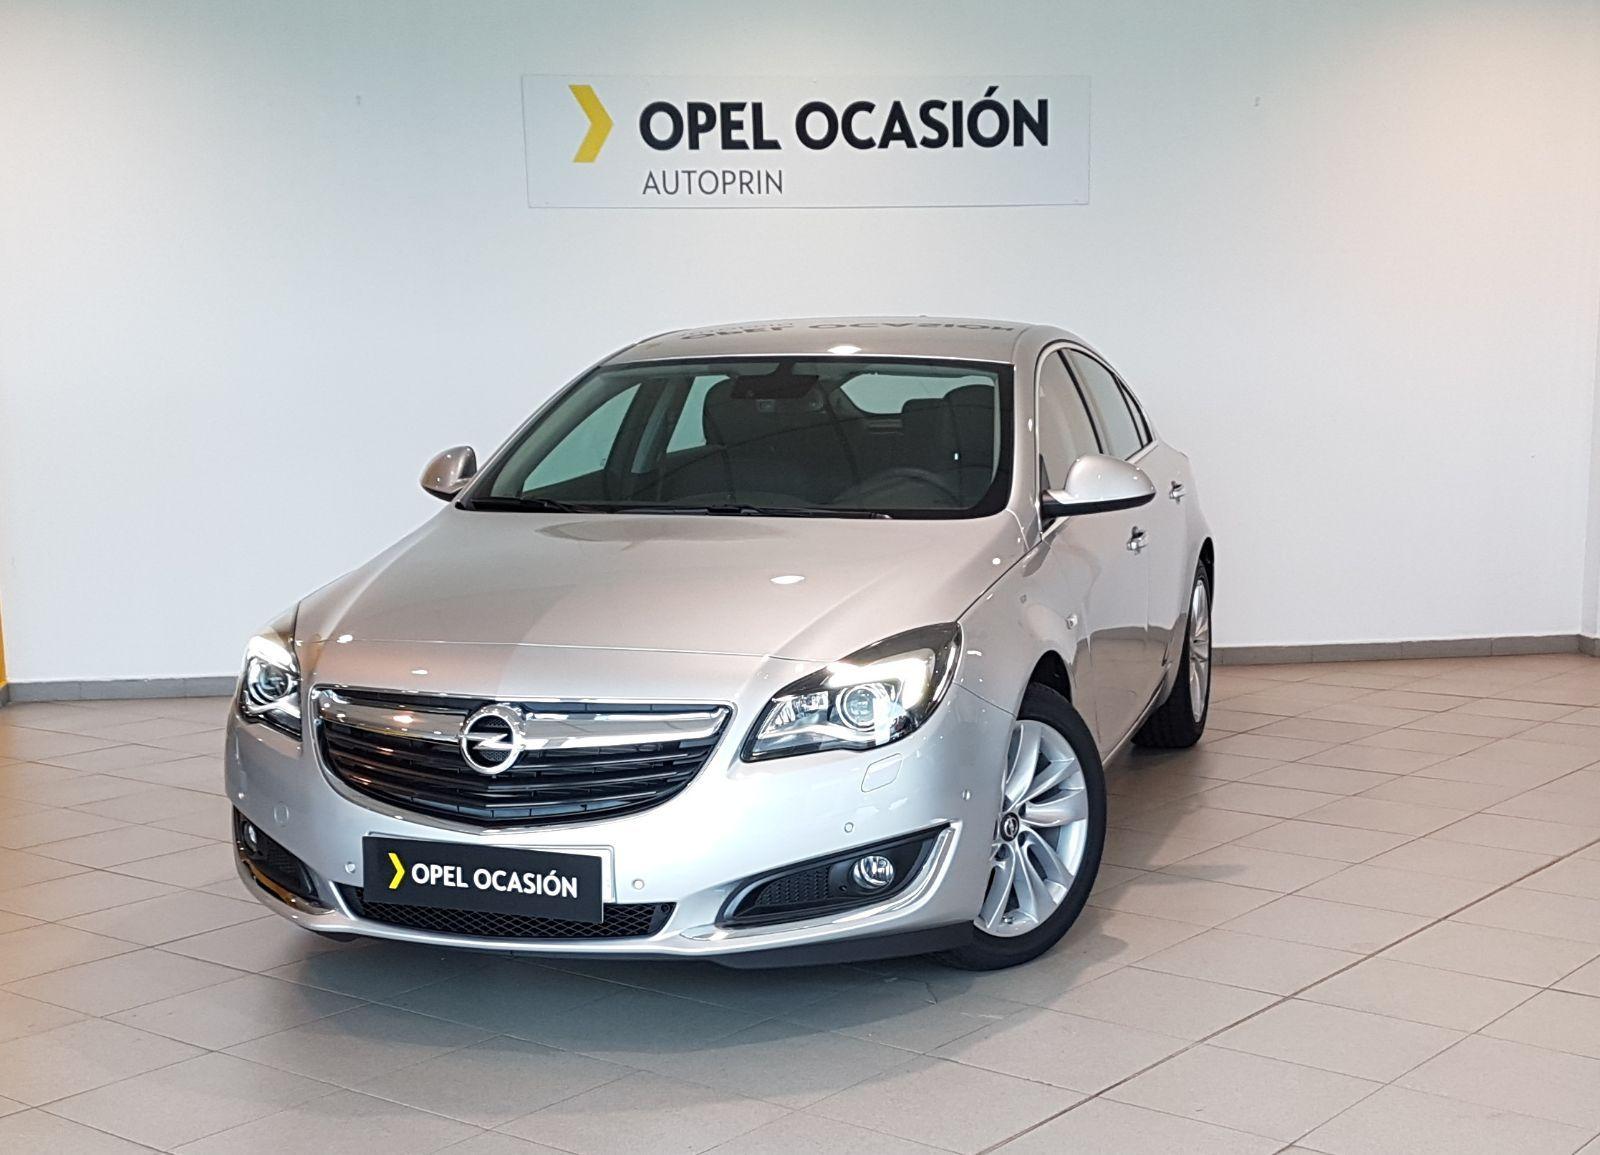 Opel Insignia Excellence por solo 20.900€ en Autoprin